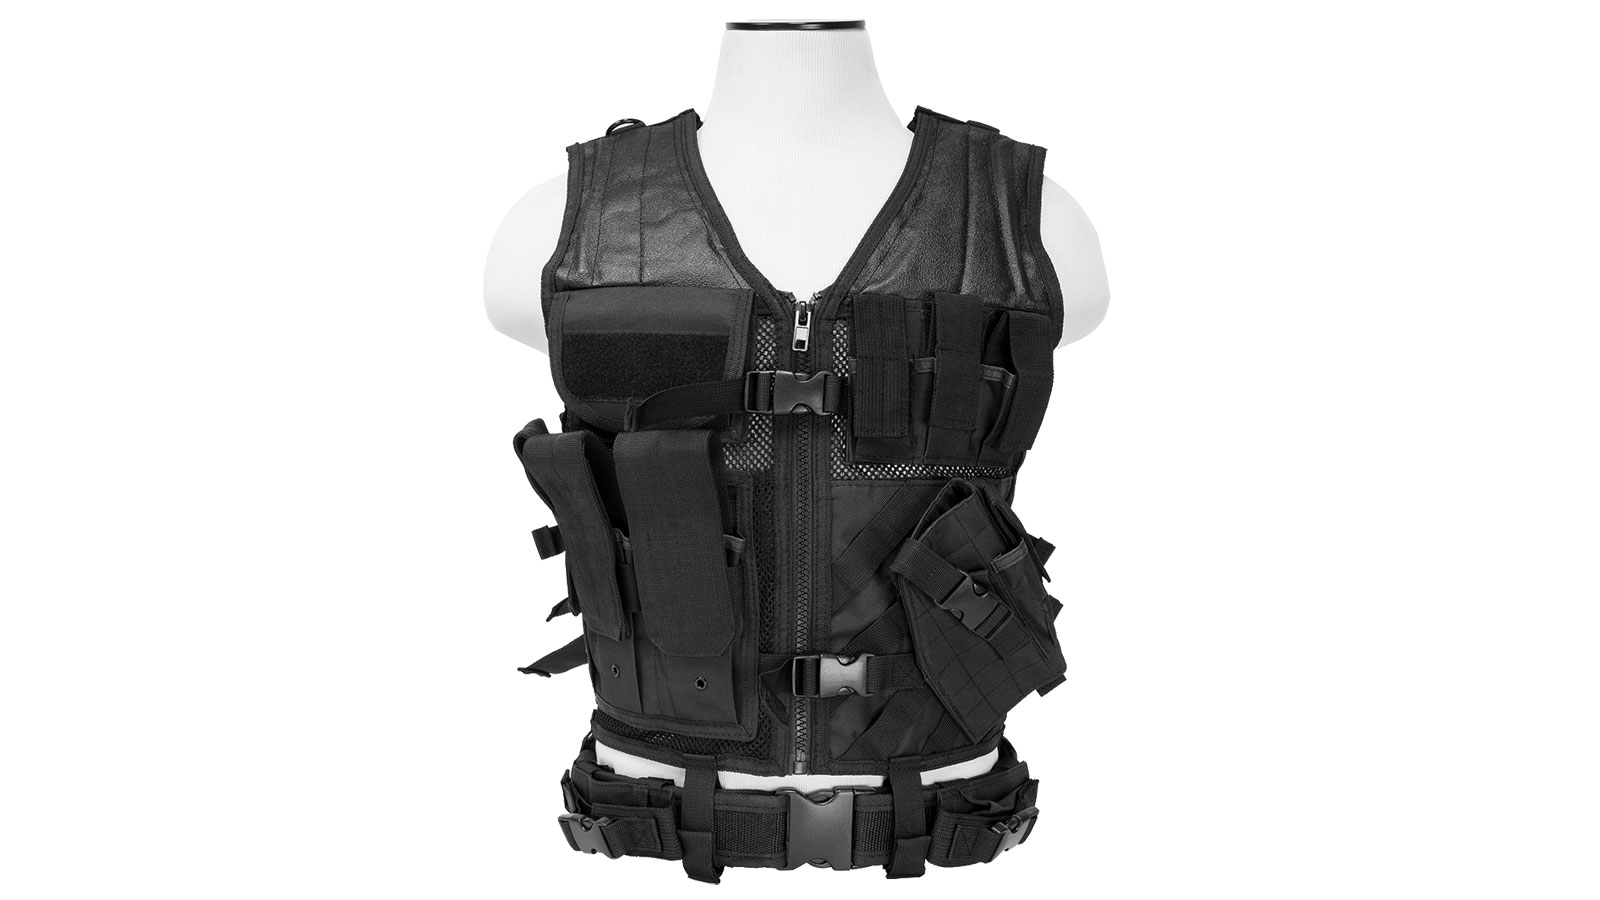 NCStar CTVL2916B Tactical Vest Black XL-XXL Tough PVC/Mesh Webbing